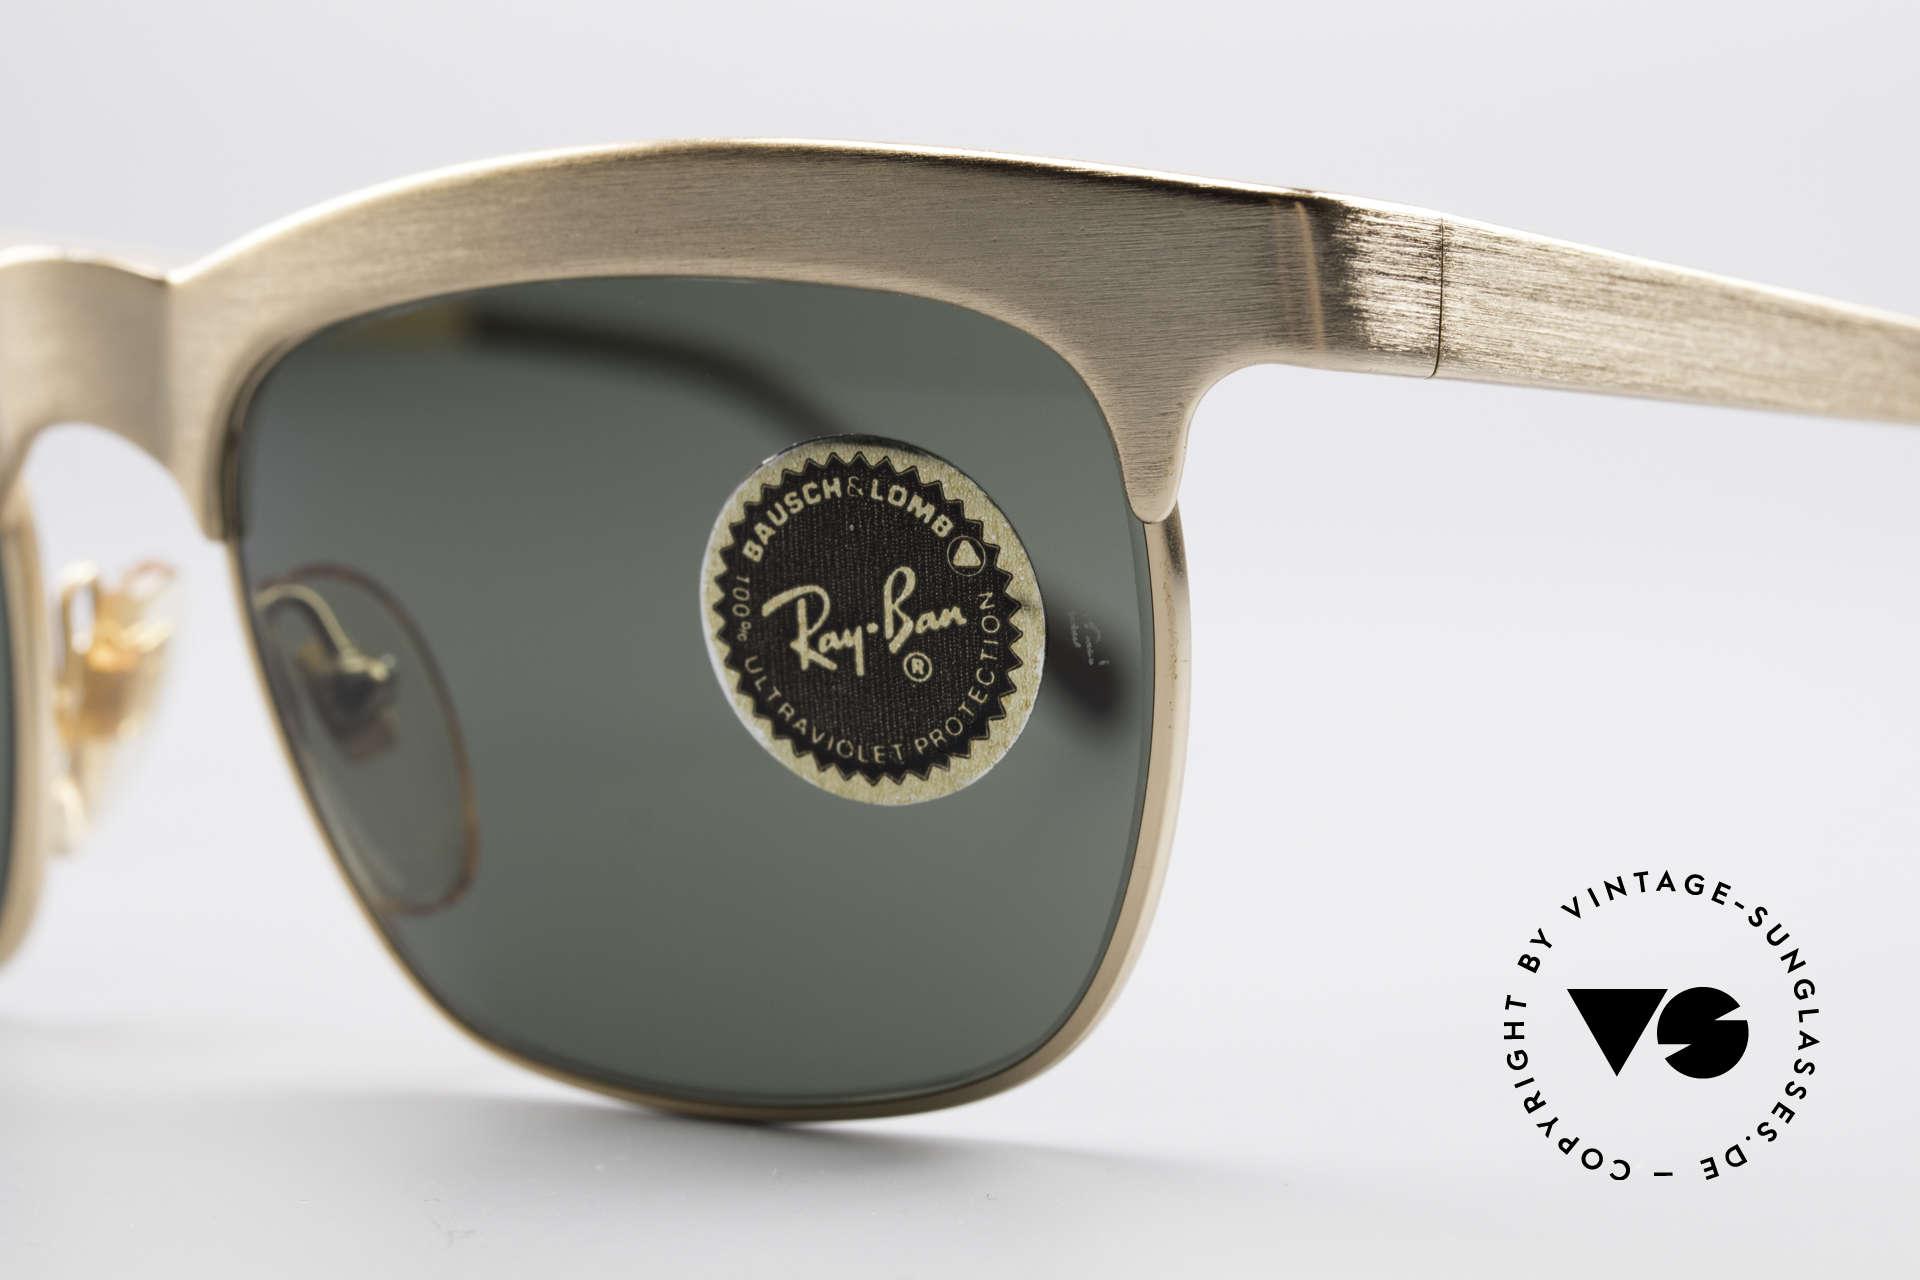 Ray Ban Nuevo 90's B&L Sunglasses W0755, genuine vintage original - NO retro sunglasses, Made for Men and Women